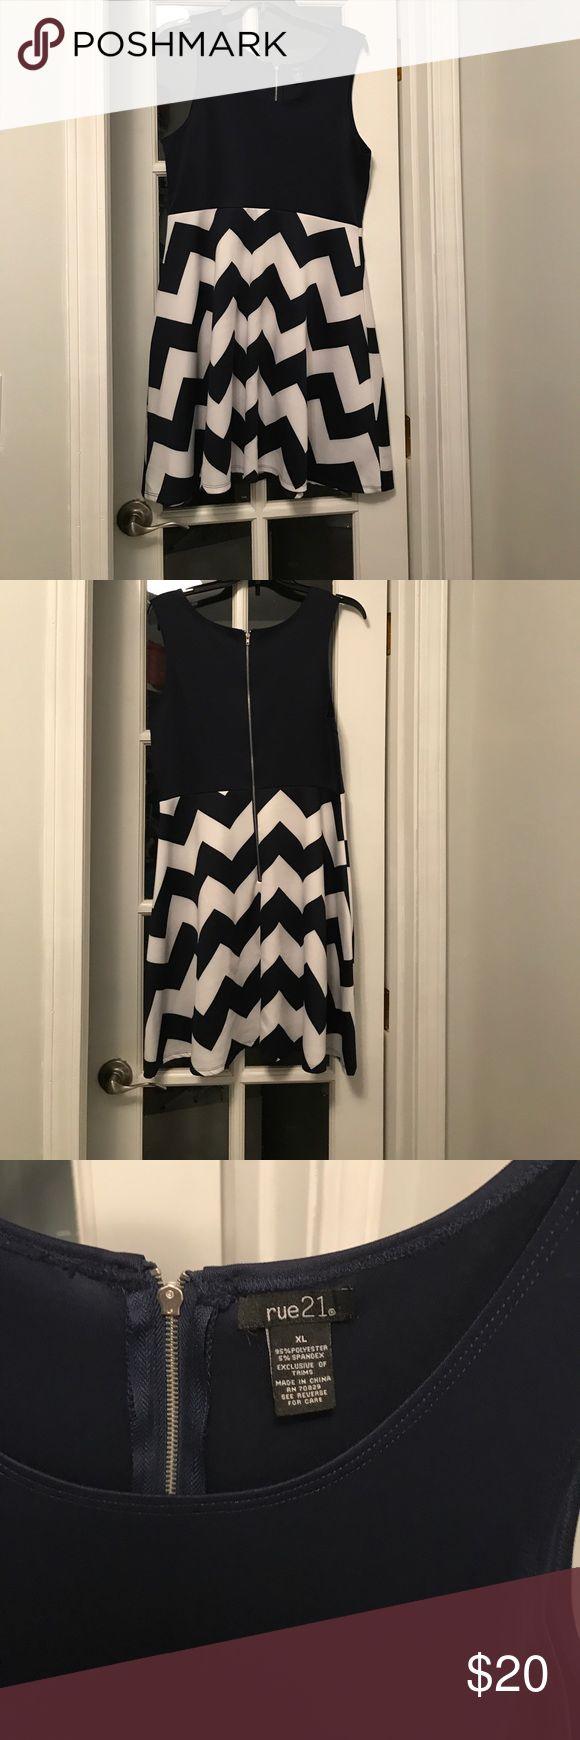 NWOT Rue21 Navy Chevron Dress Cute Navy Chevron Dress. Size XL Rue 21 Dresses